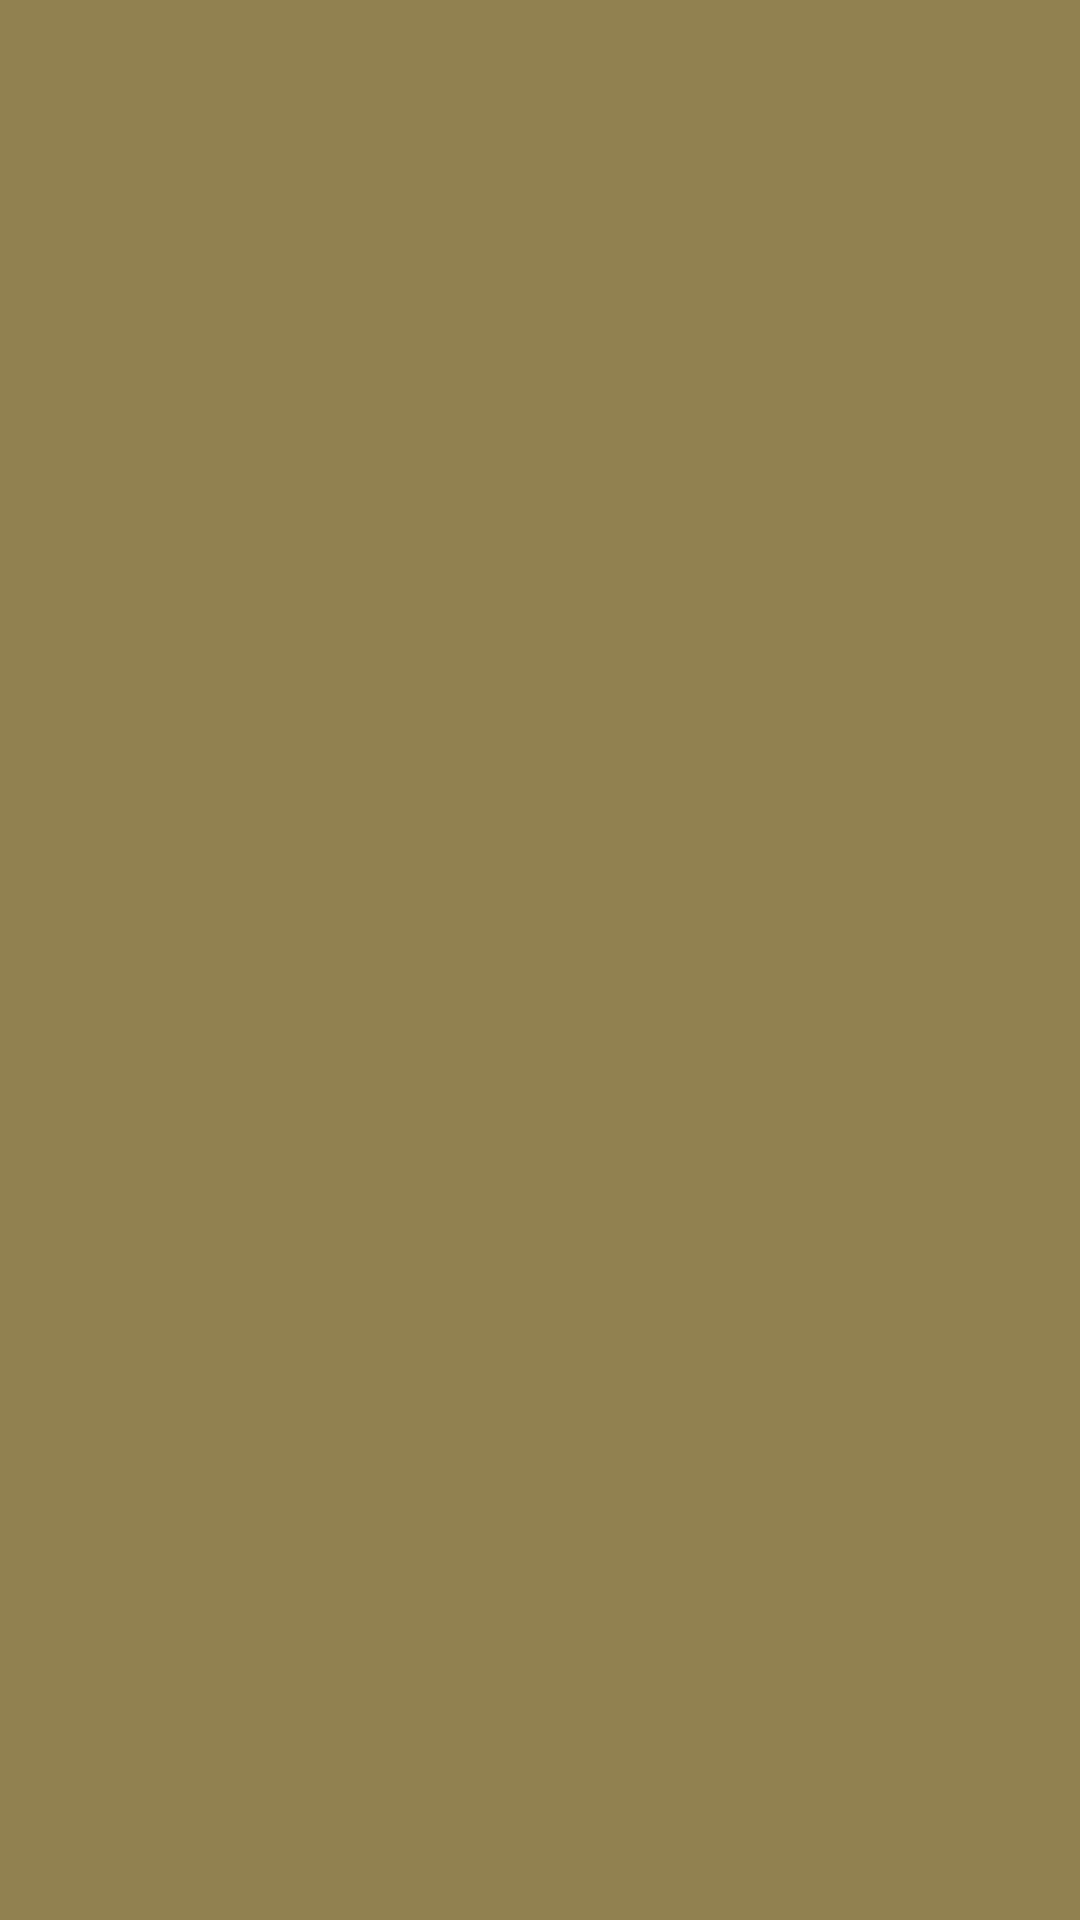 1080x1920 Dark Tan Solid Color Background